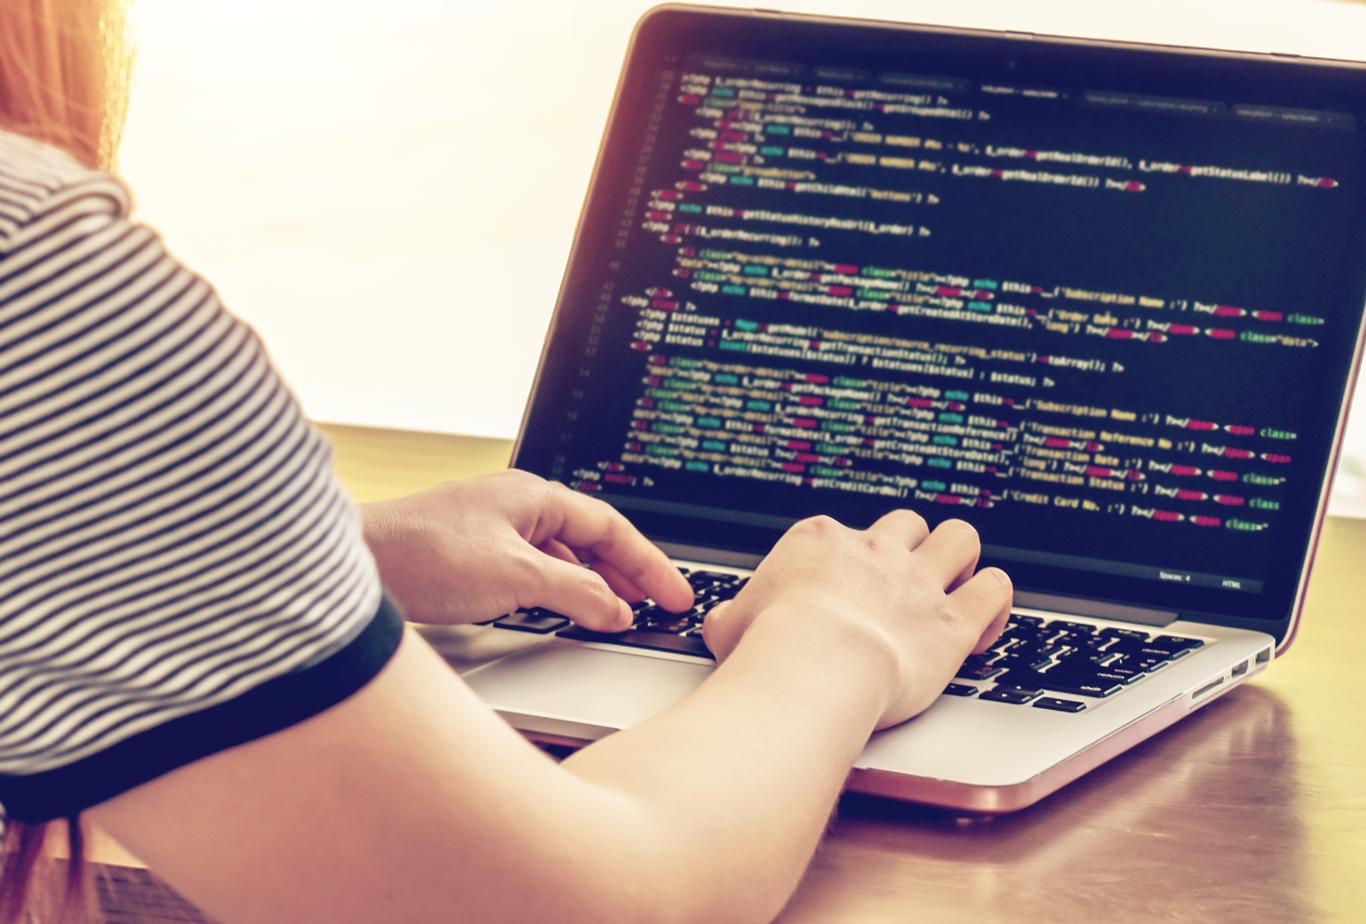 Coding-computer-girl-1366-1118